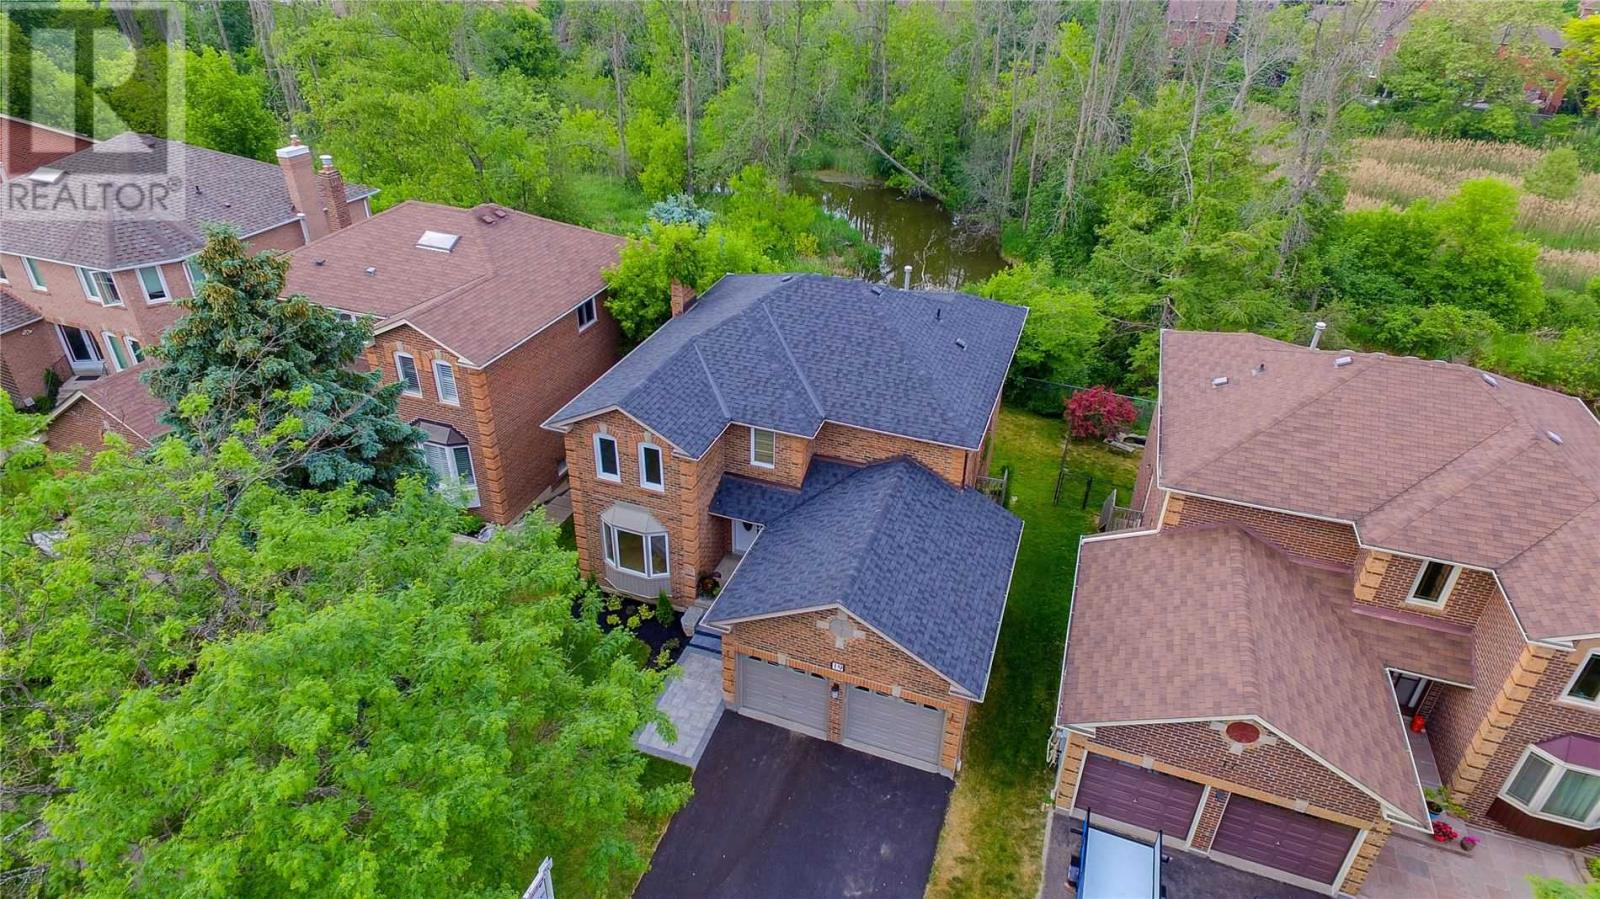 19 Mayor Cres, Ajax, Ontario  L1S 6N5 - Photo 2 - E4820049